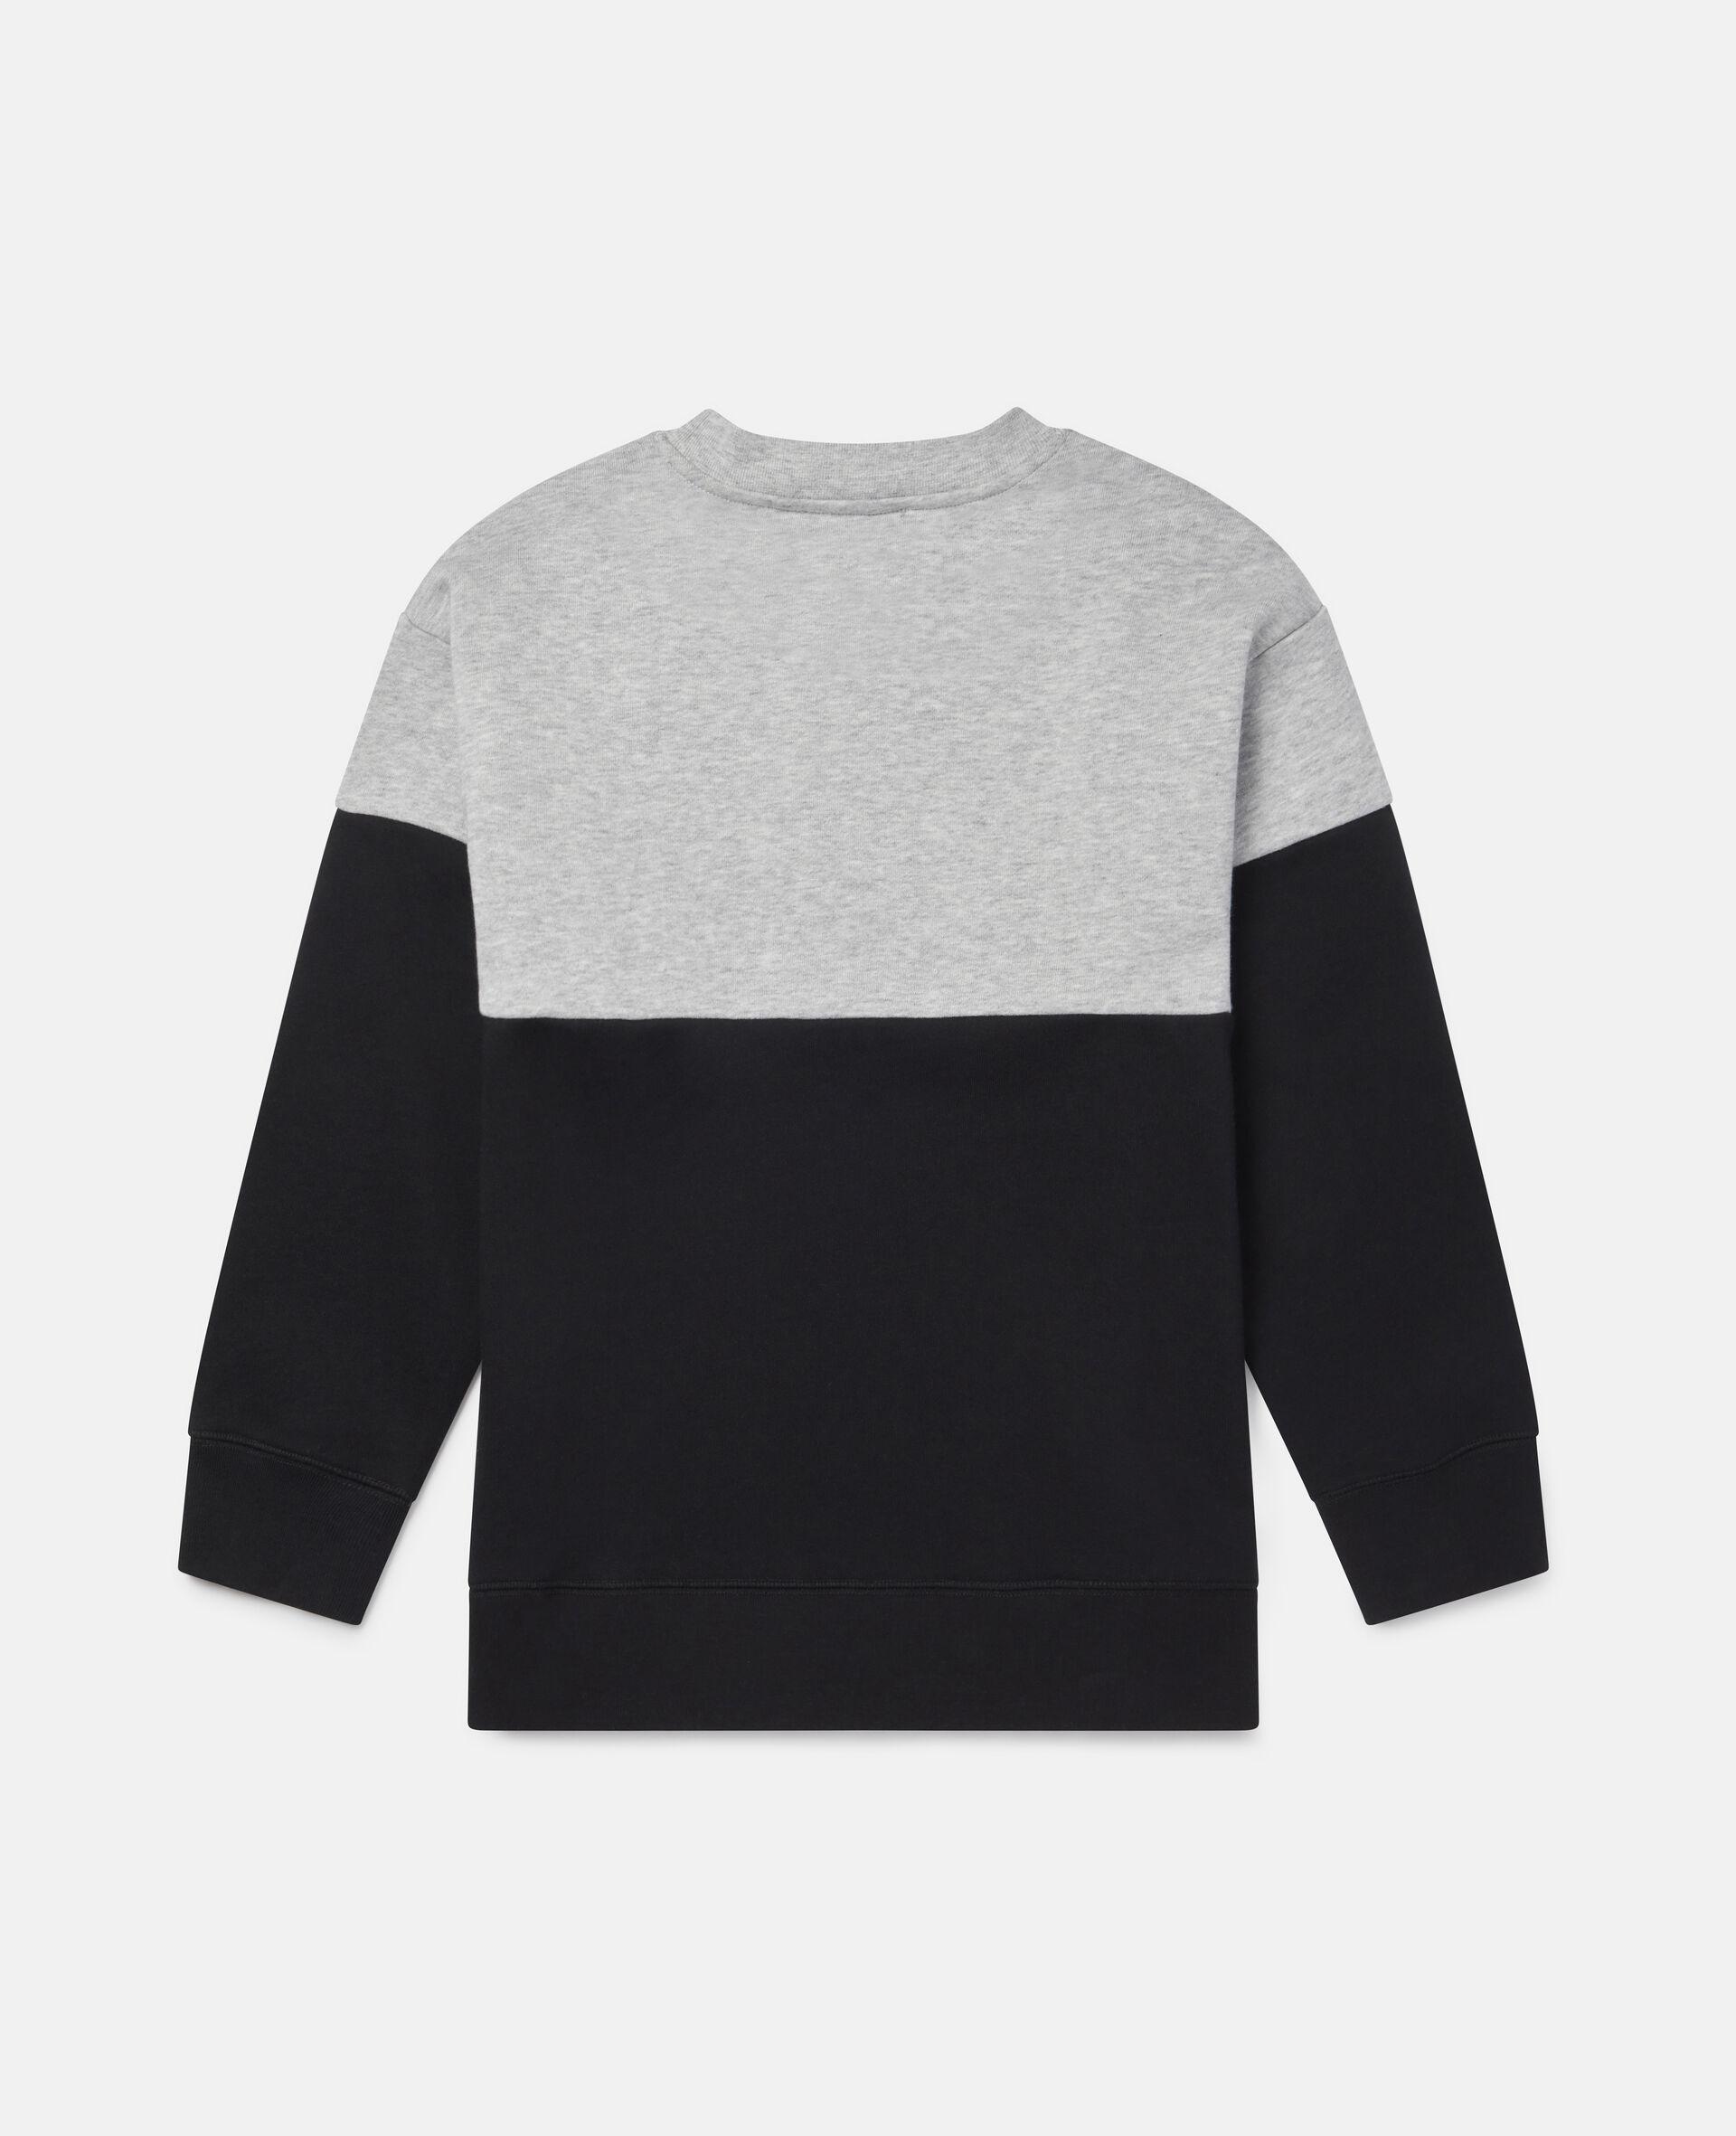 Oversized Wild Fleece Sweatshirt-Multicolour-large image number 3